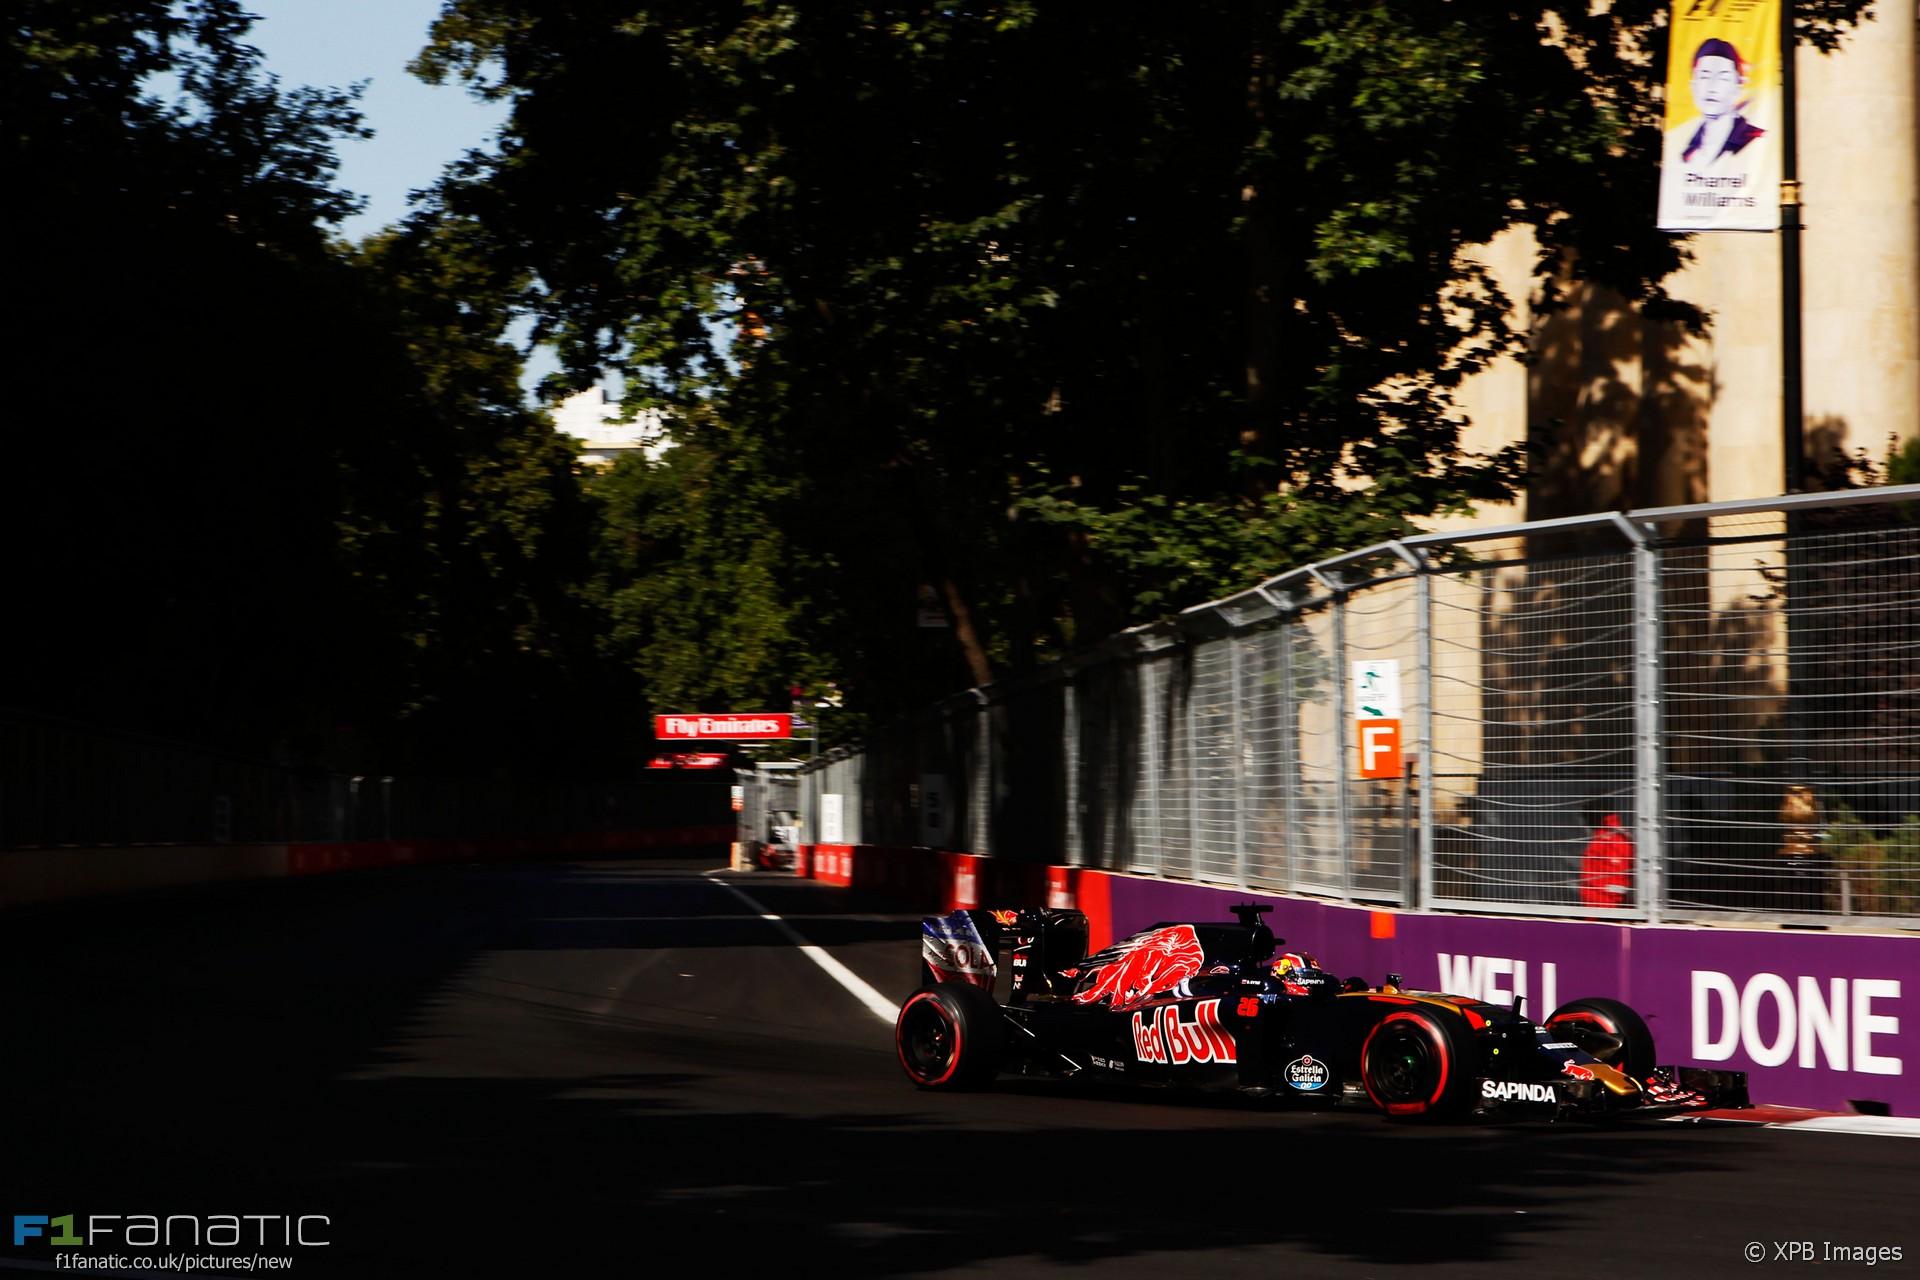 Daniil Kvyat, Toro Rosso, Baku City Circuit, 2016